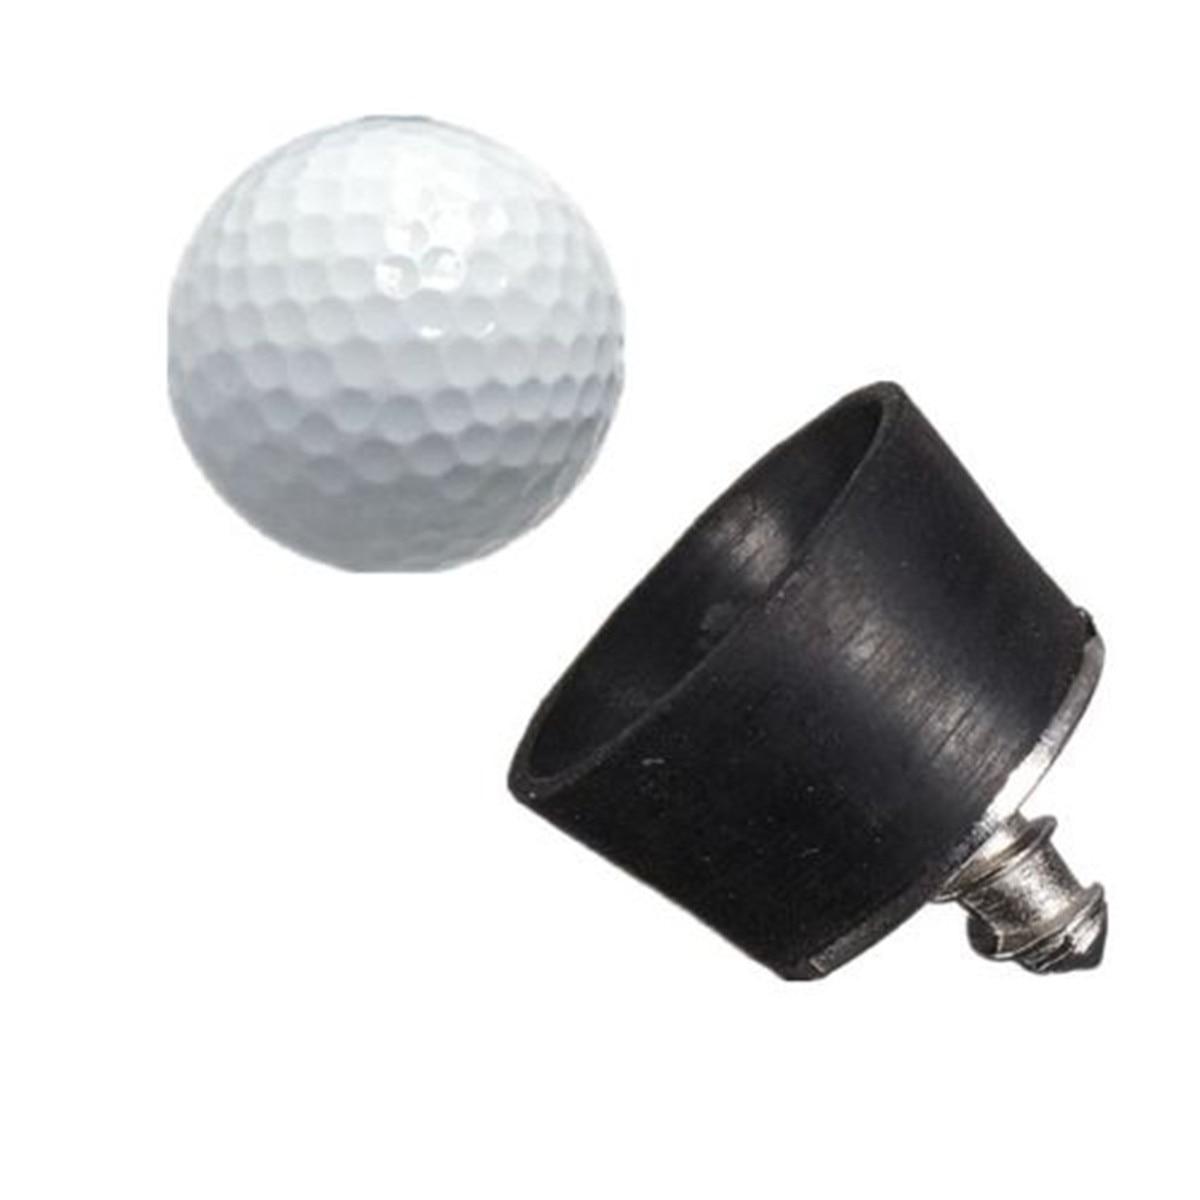 Hot Sale mini Rubber Golf Ball Pick Up Putter Grip Retriever Tool Suction Cup Pickup Screw  golf training aids